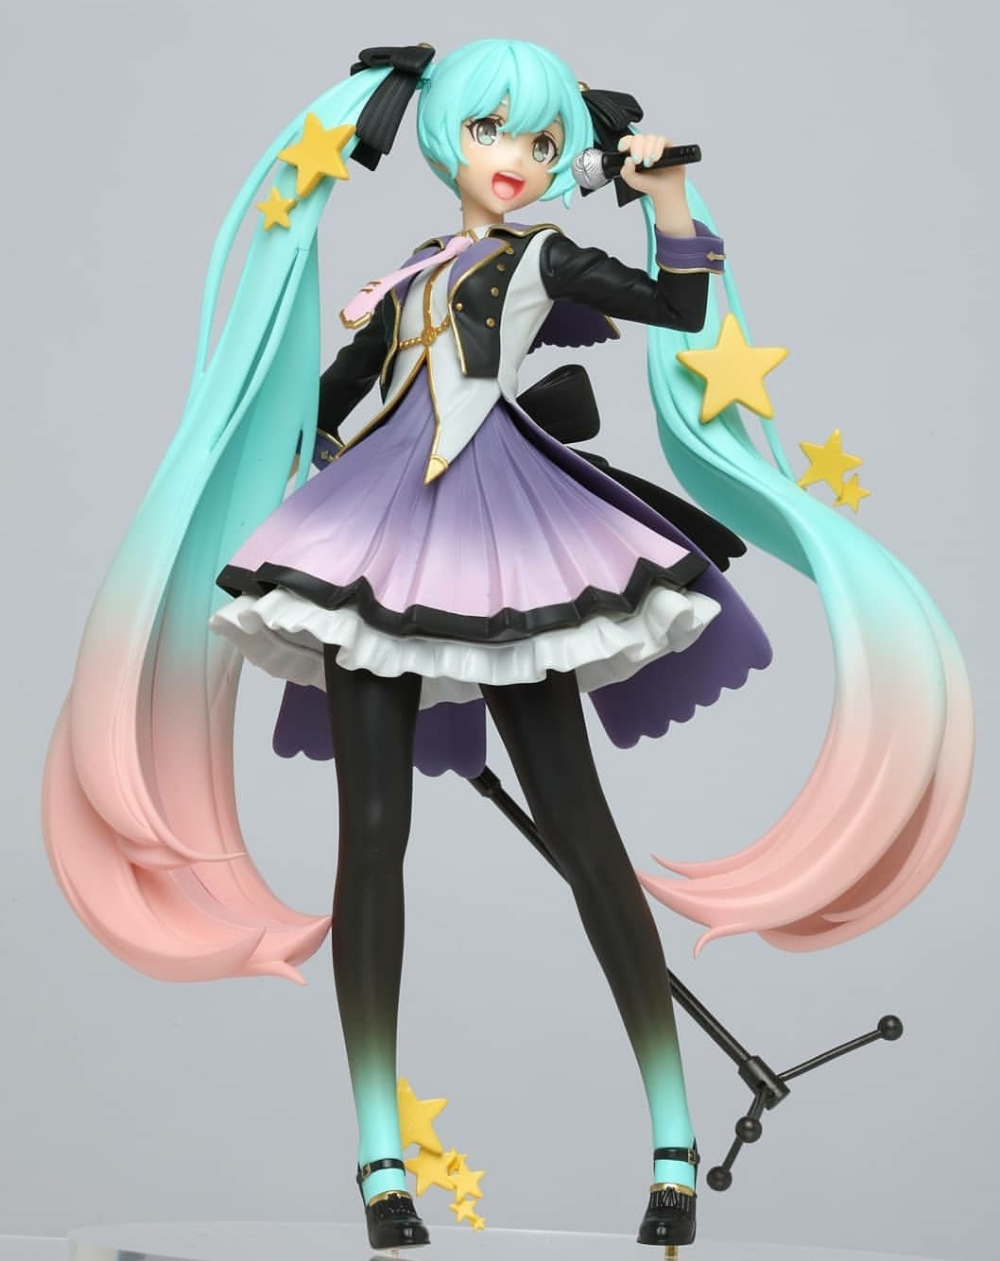 figure blog Anime figurines, Anime merchandise, Anime